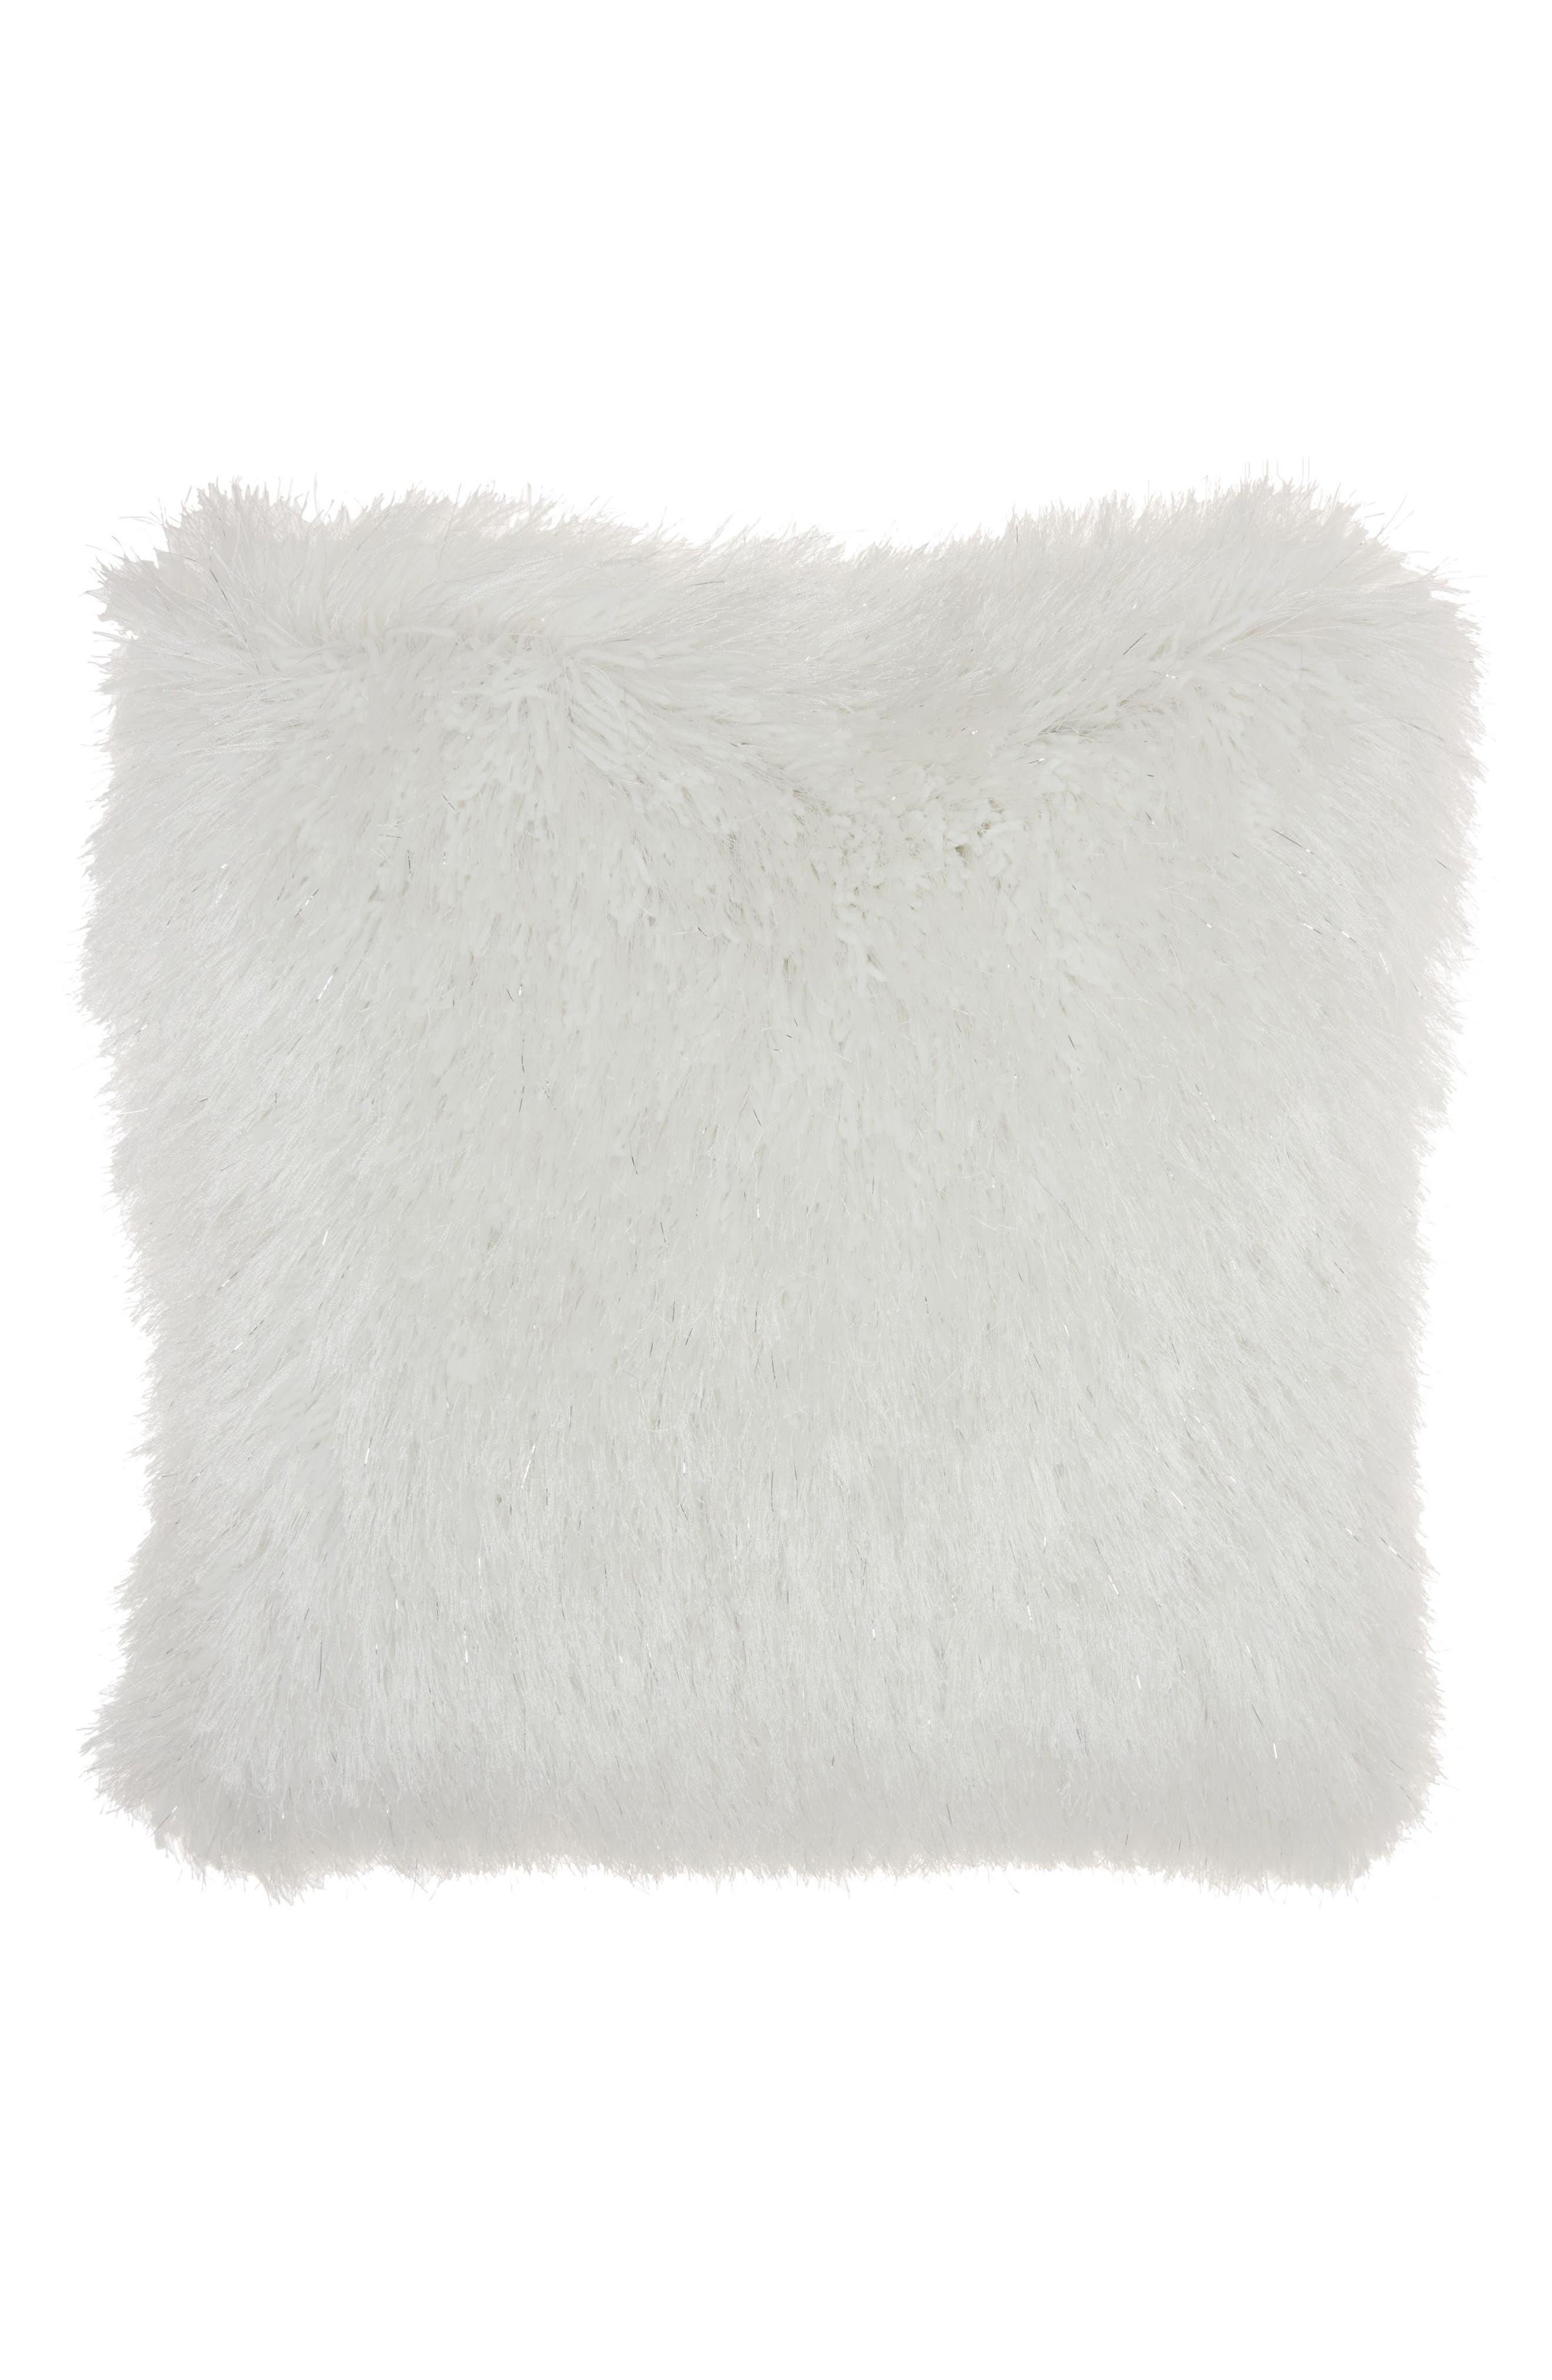 Shag Pillow,                         Main,                         color, WHITE